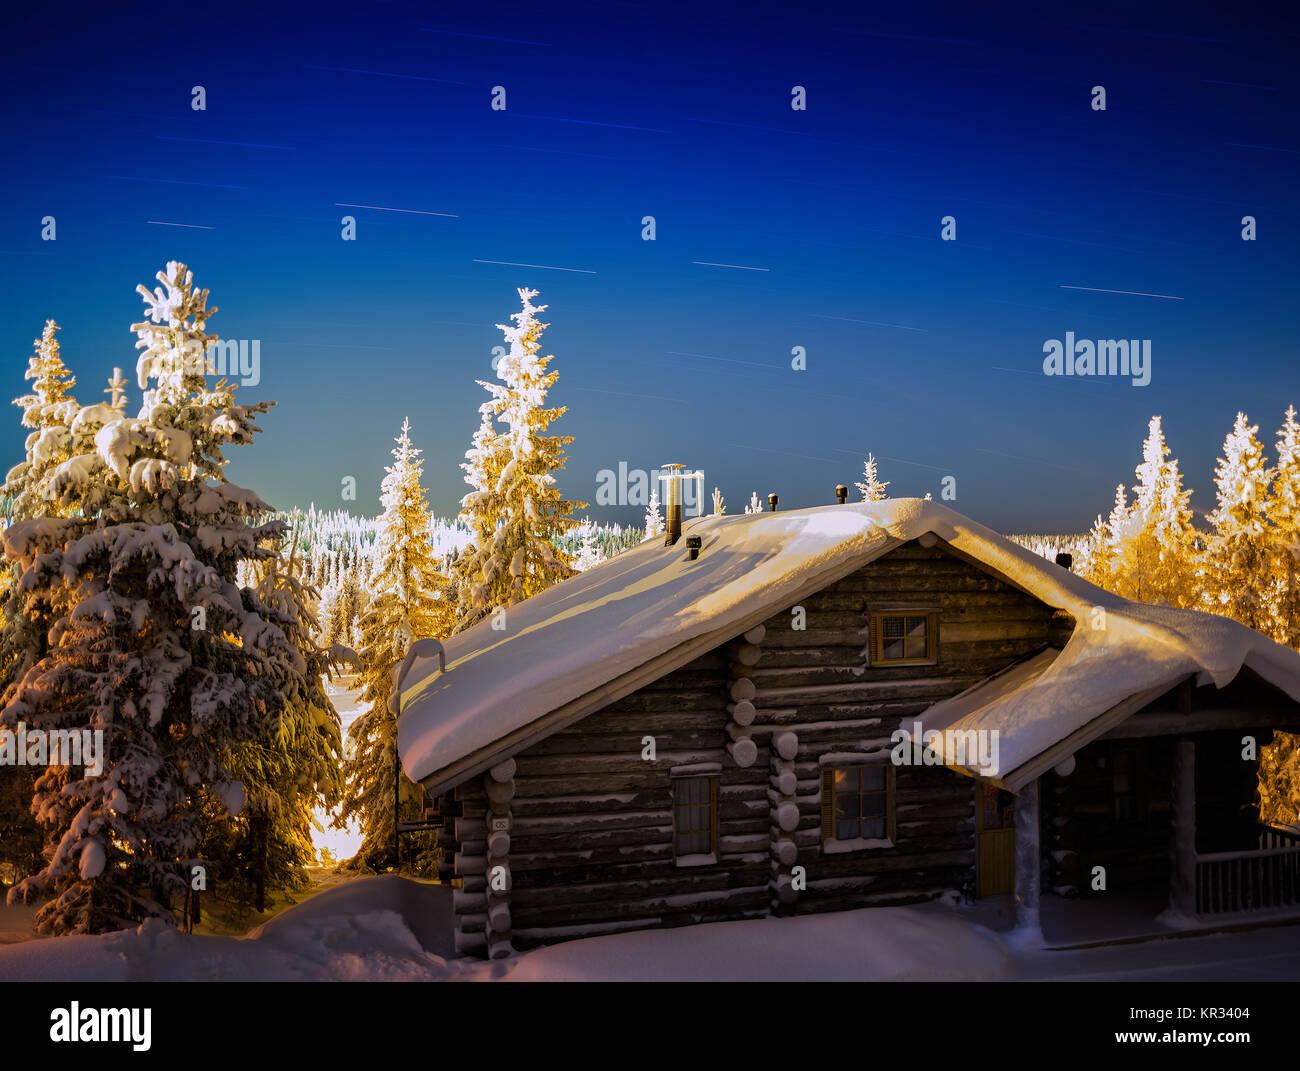 Norway Christmas Figure Stock Photos & Norway Christmas Figure Stock ...